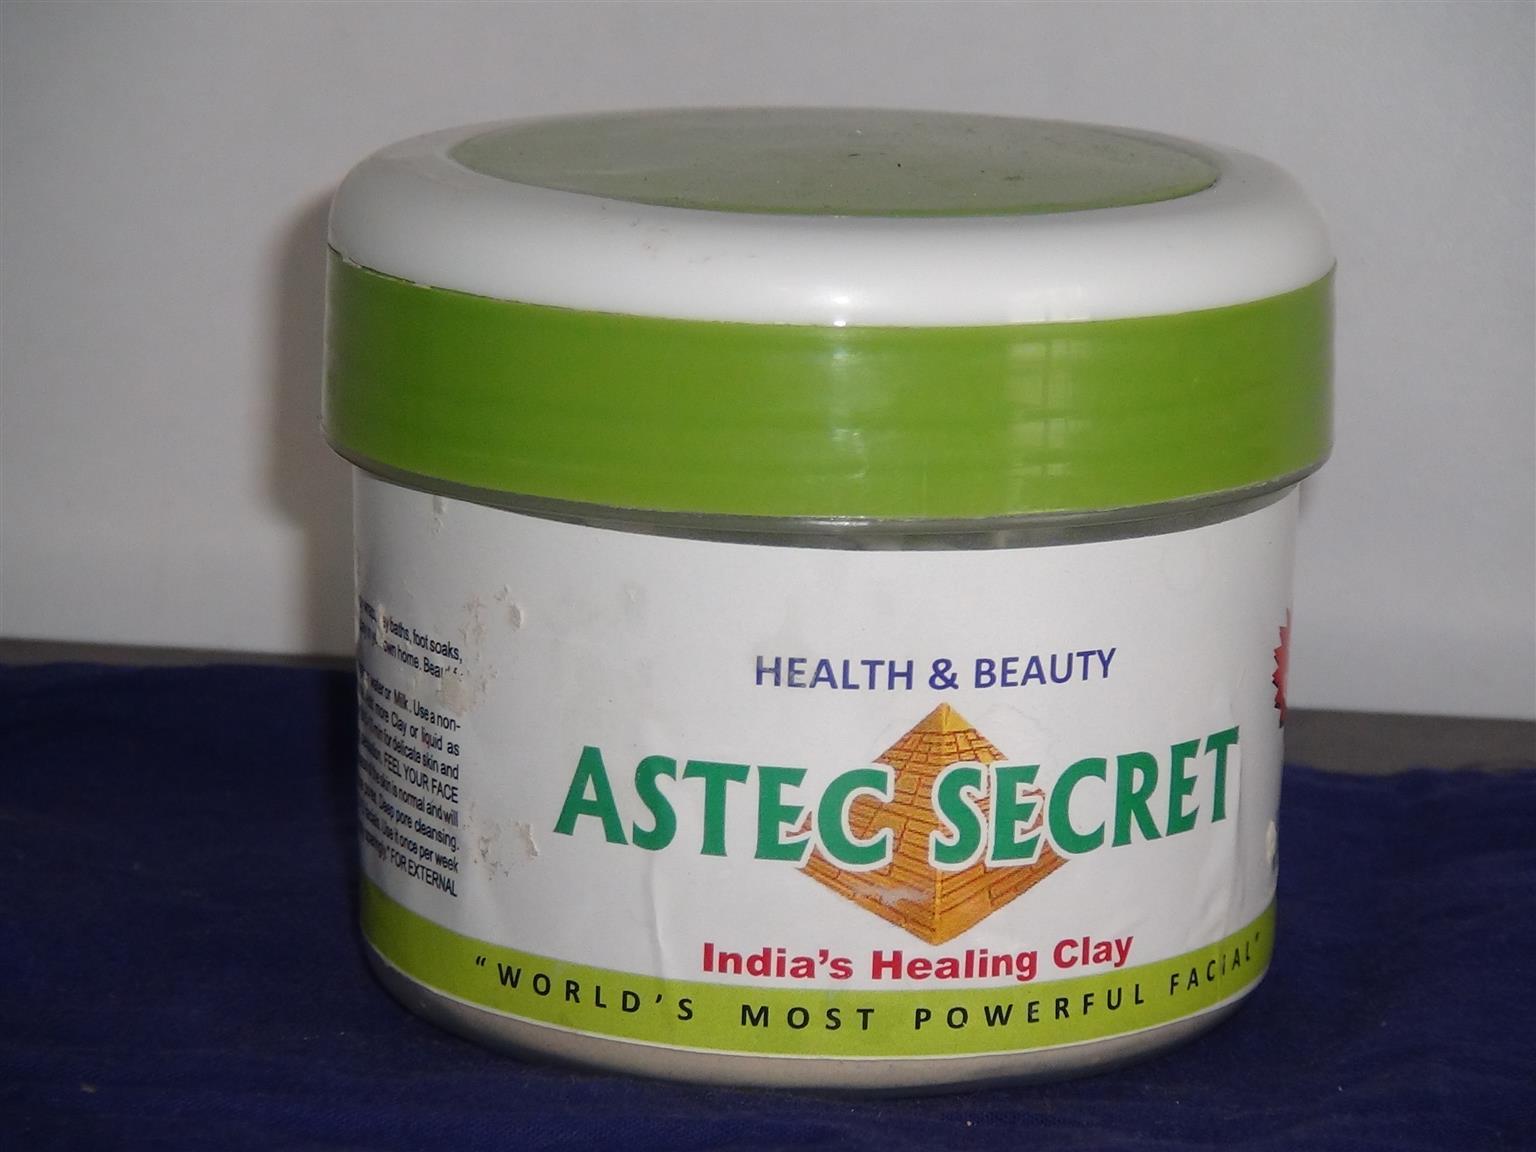 ASTEC SECRET HEALTH & BEAUTY WORLDS MOST POWERFULL FACIAL